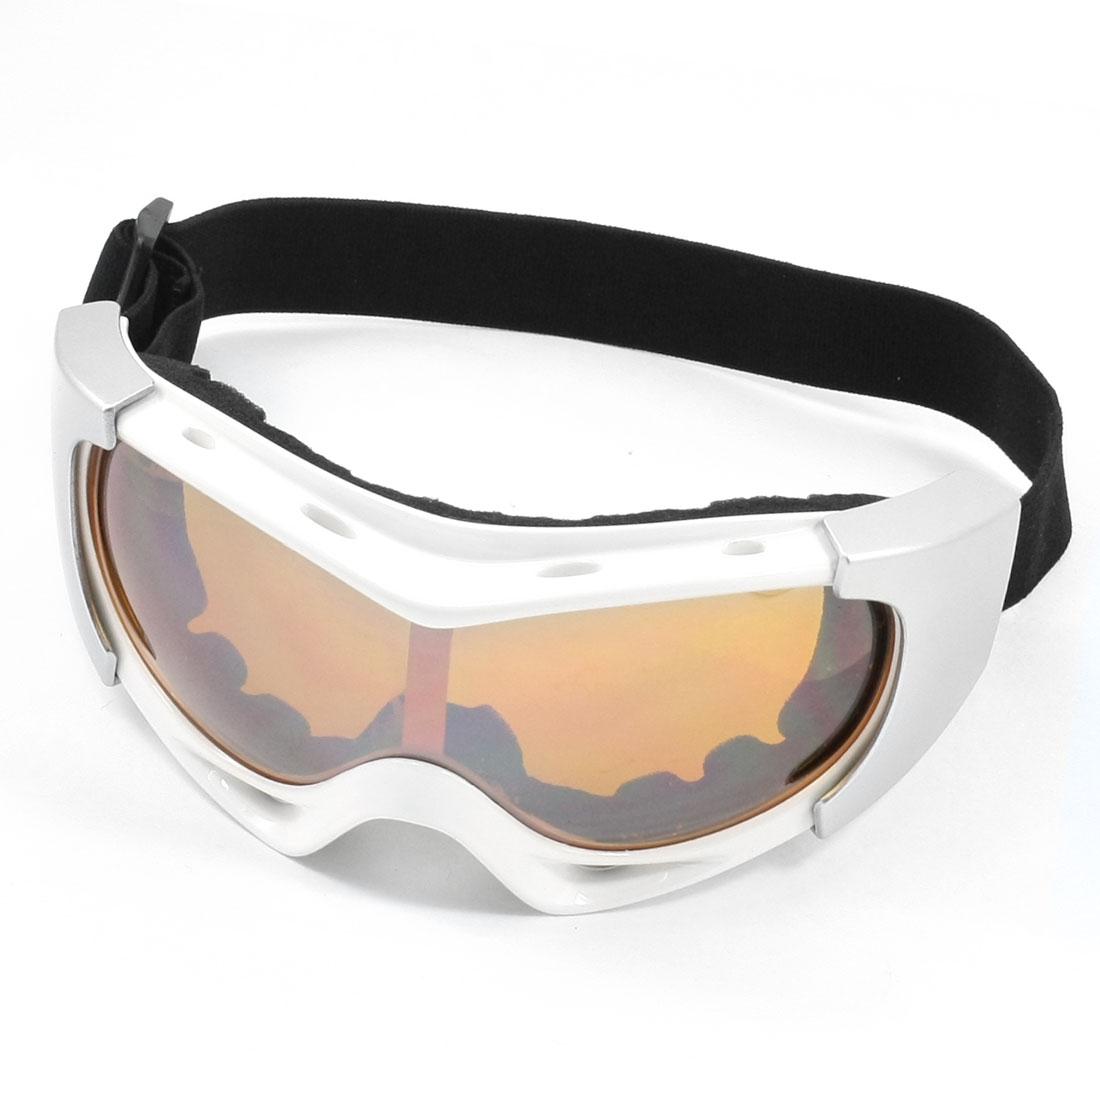 Unisex Yellow Lens Ski Snowboard Sports Goggles White